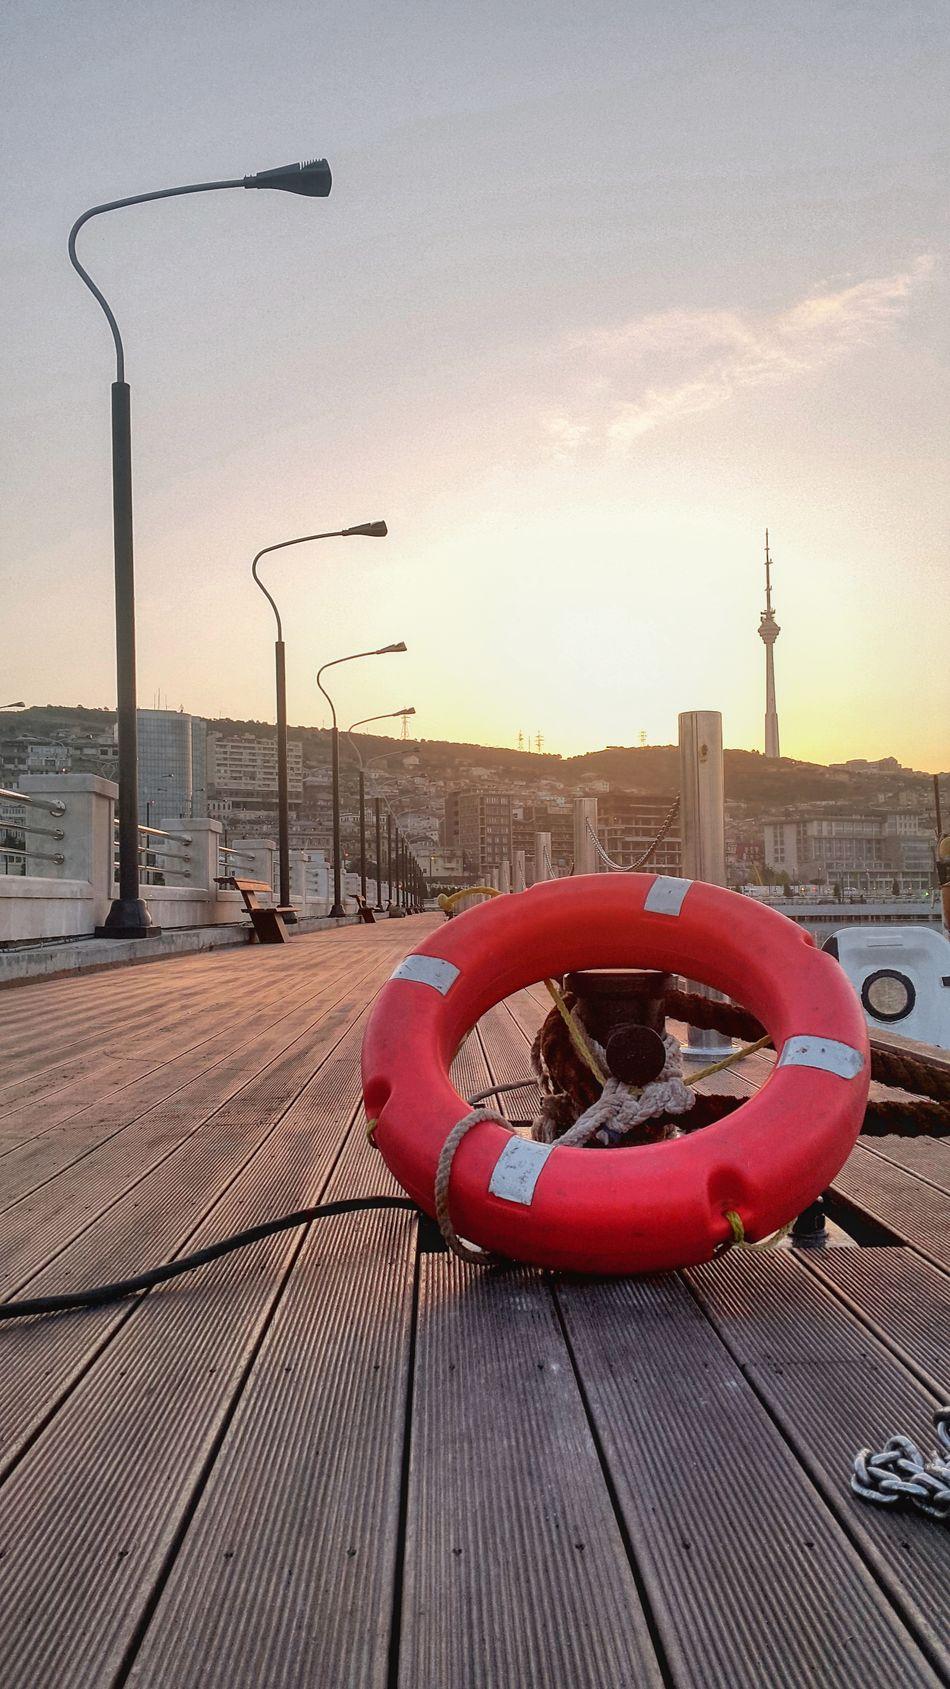 Baku Azerbaijan Vscogood Vscoartist #vscogallery #vscocamphotos #visualsoflife #igmasters #visualsgang #vscolovers #vscovibe #letsgosomewhere #neverstopexploring #vscoexpo #vscocamgram #vscogang #streetdreamsmag #vscocamonly #socality #vscomania #lifeofadventure #vscocool #vscomo Vscoazerbaijan Vscoazerbaijan_ Vscocam Amazing Mobilephotography Baku♡♥ Baku City Hello World Neriman_faiqoglu Baku Sunset